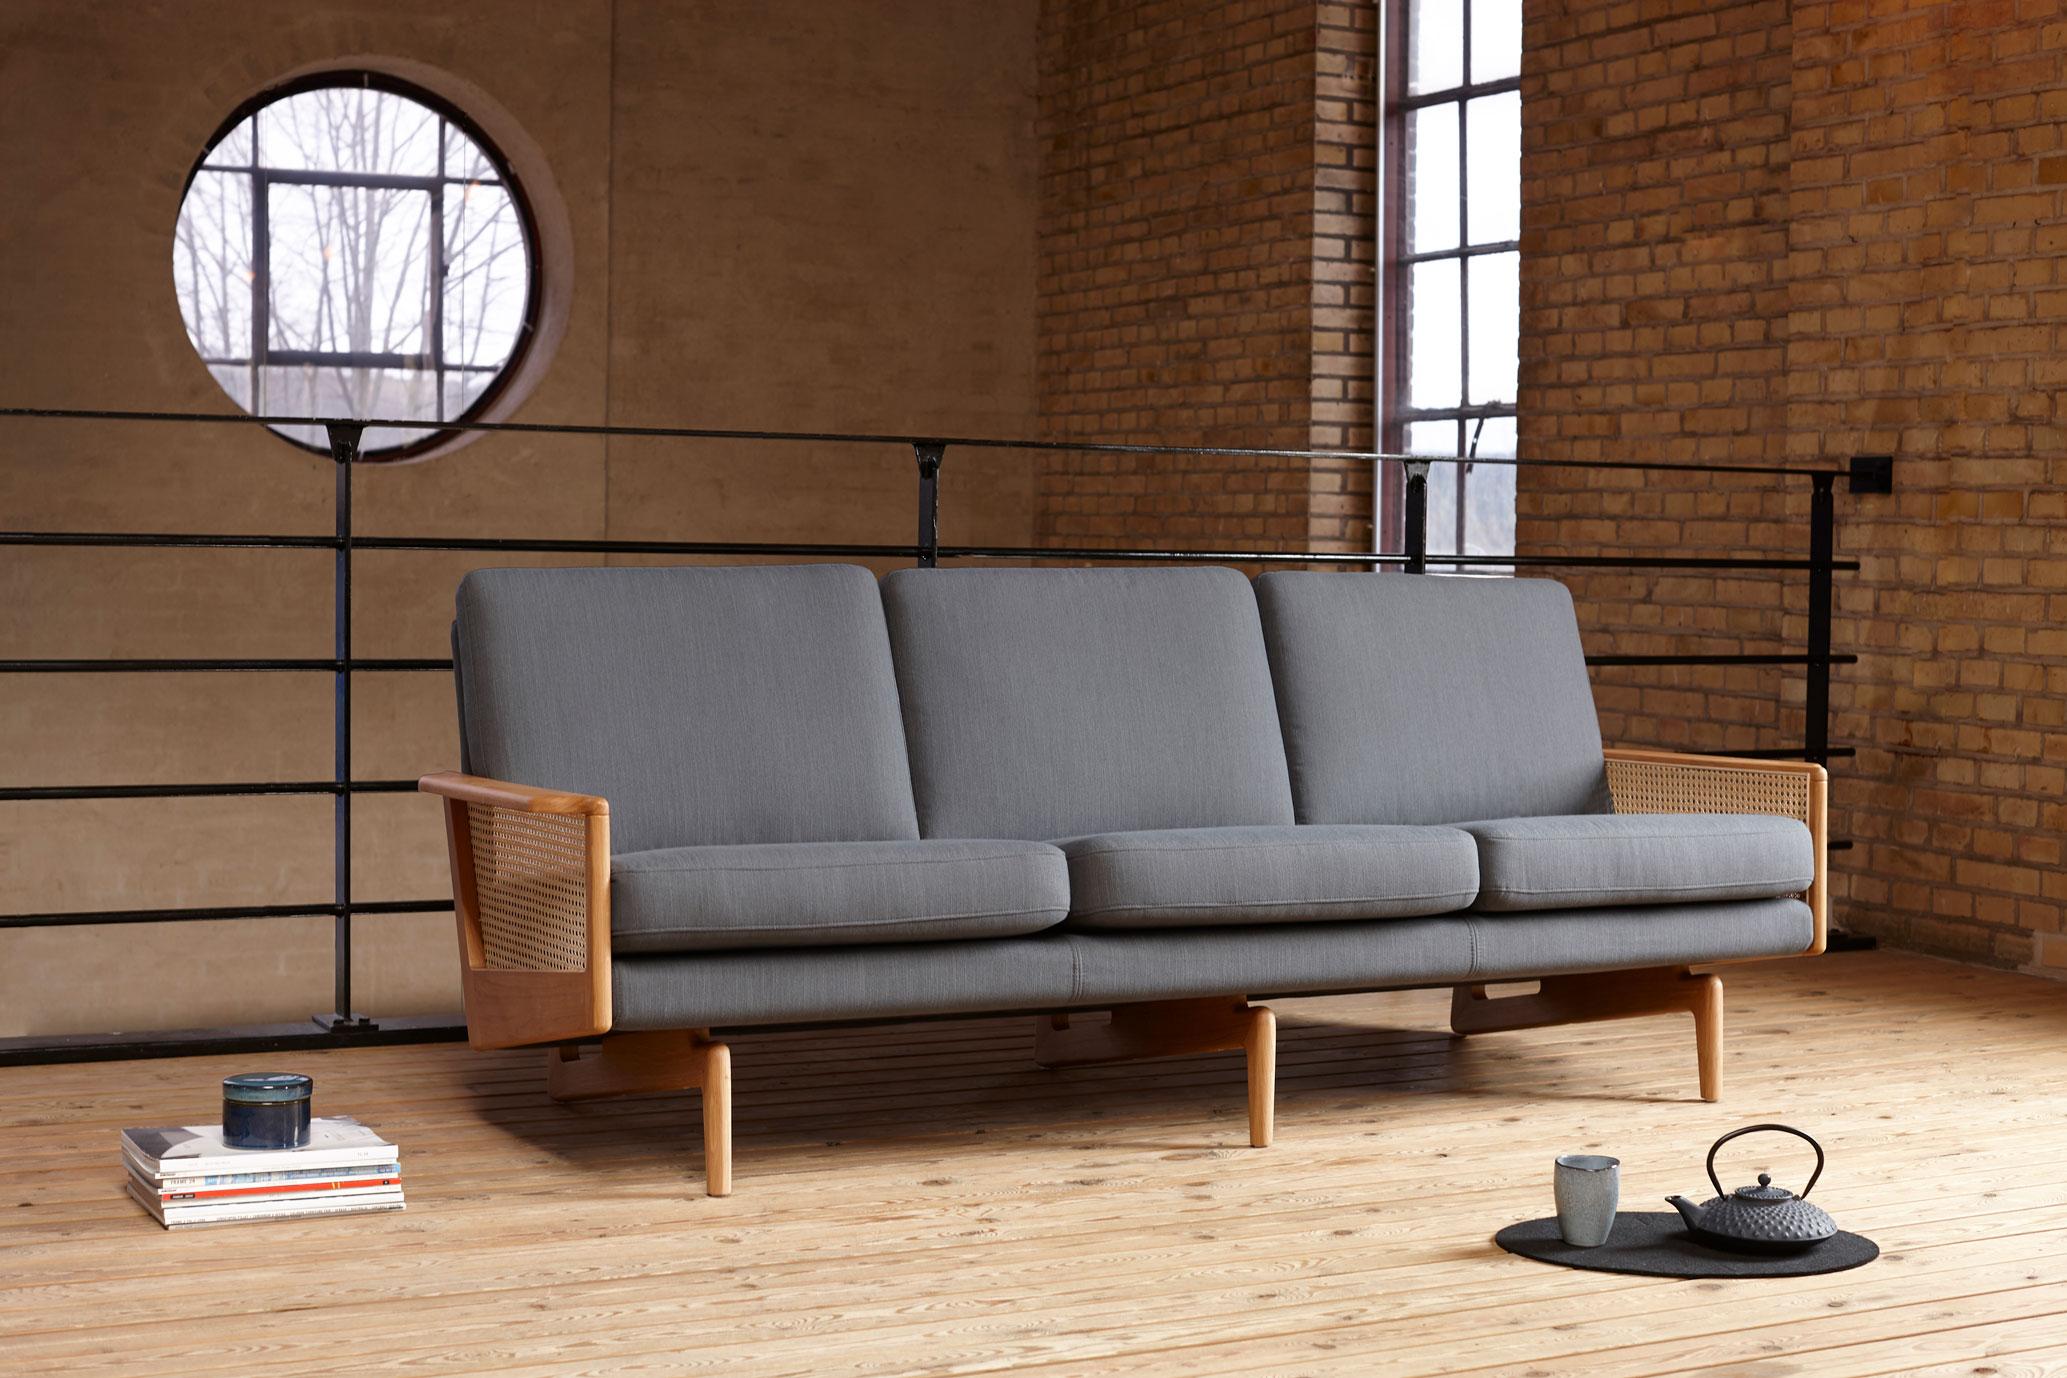 egsmark-sofa-cane-web-oliver-lukas-weisskrogh-14.jpg